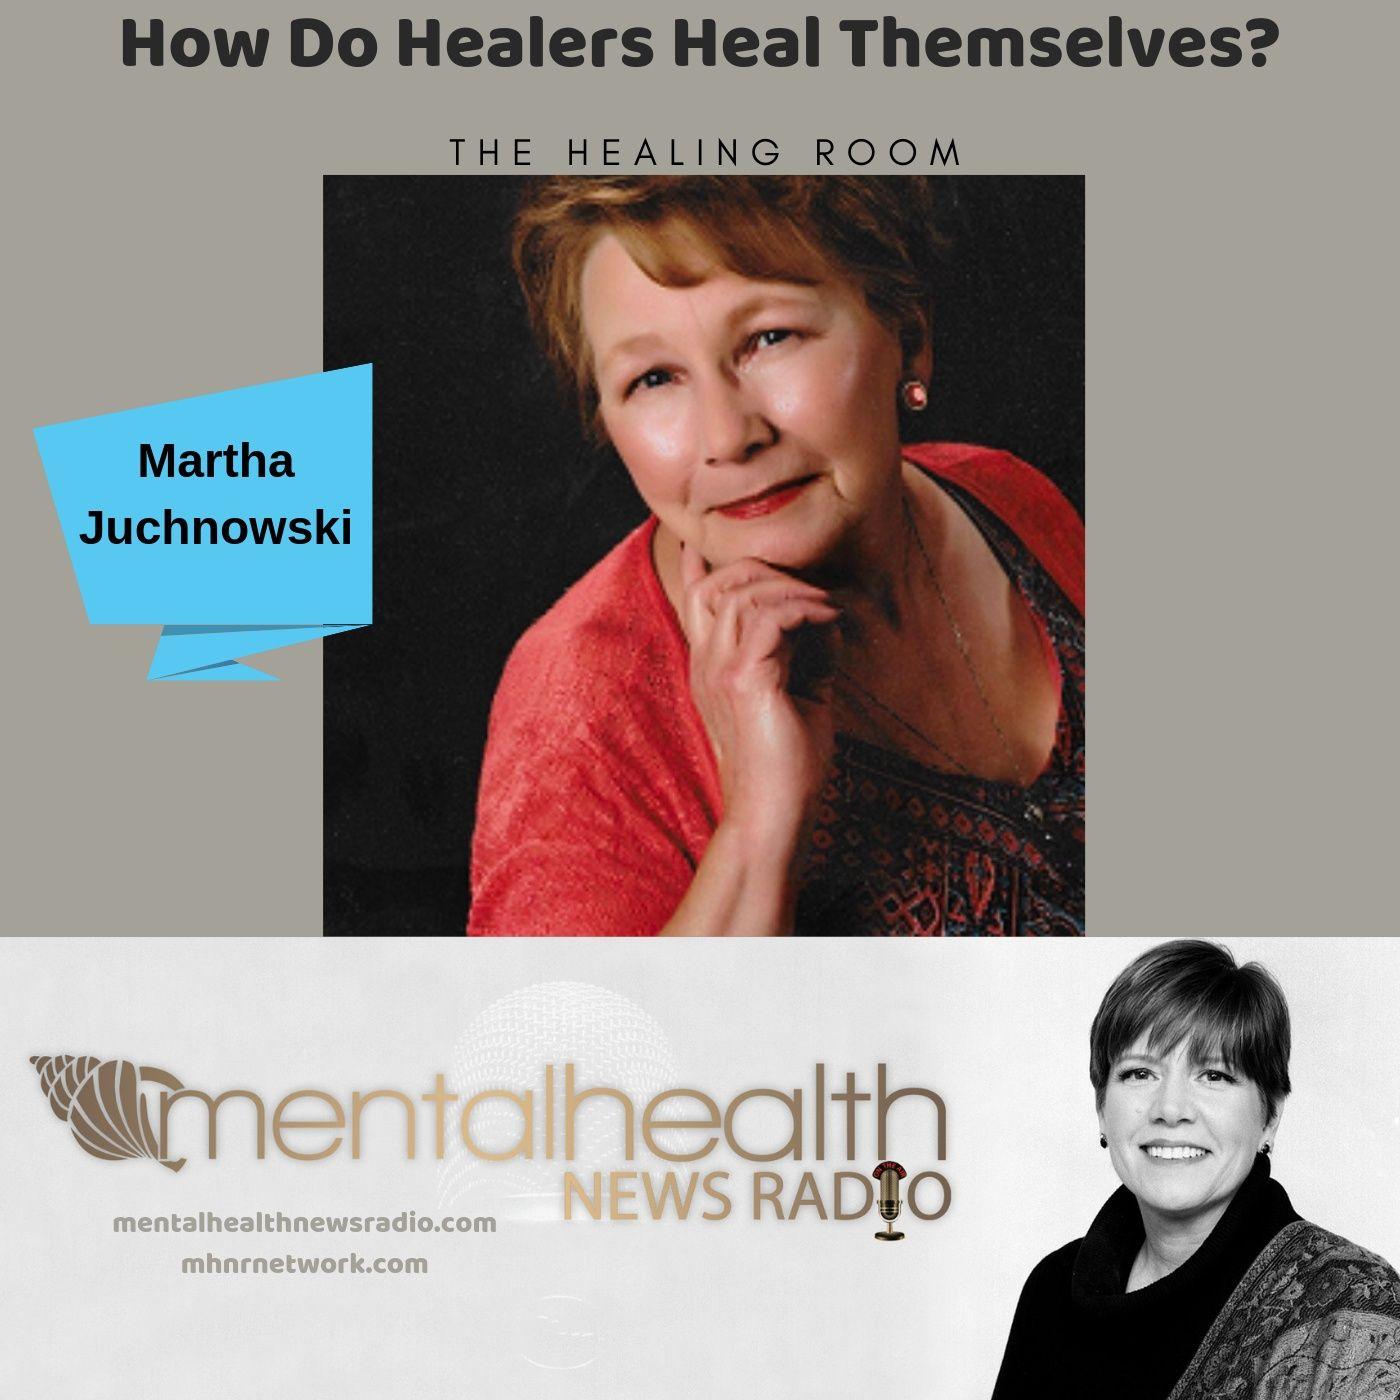 Mental Health News Radio - The Healing Room: How Do Healers Heal Themselves?